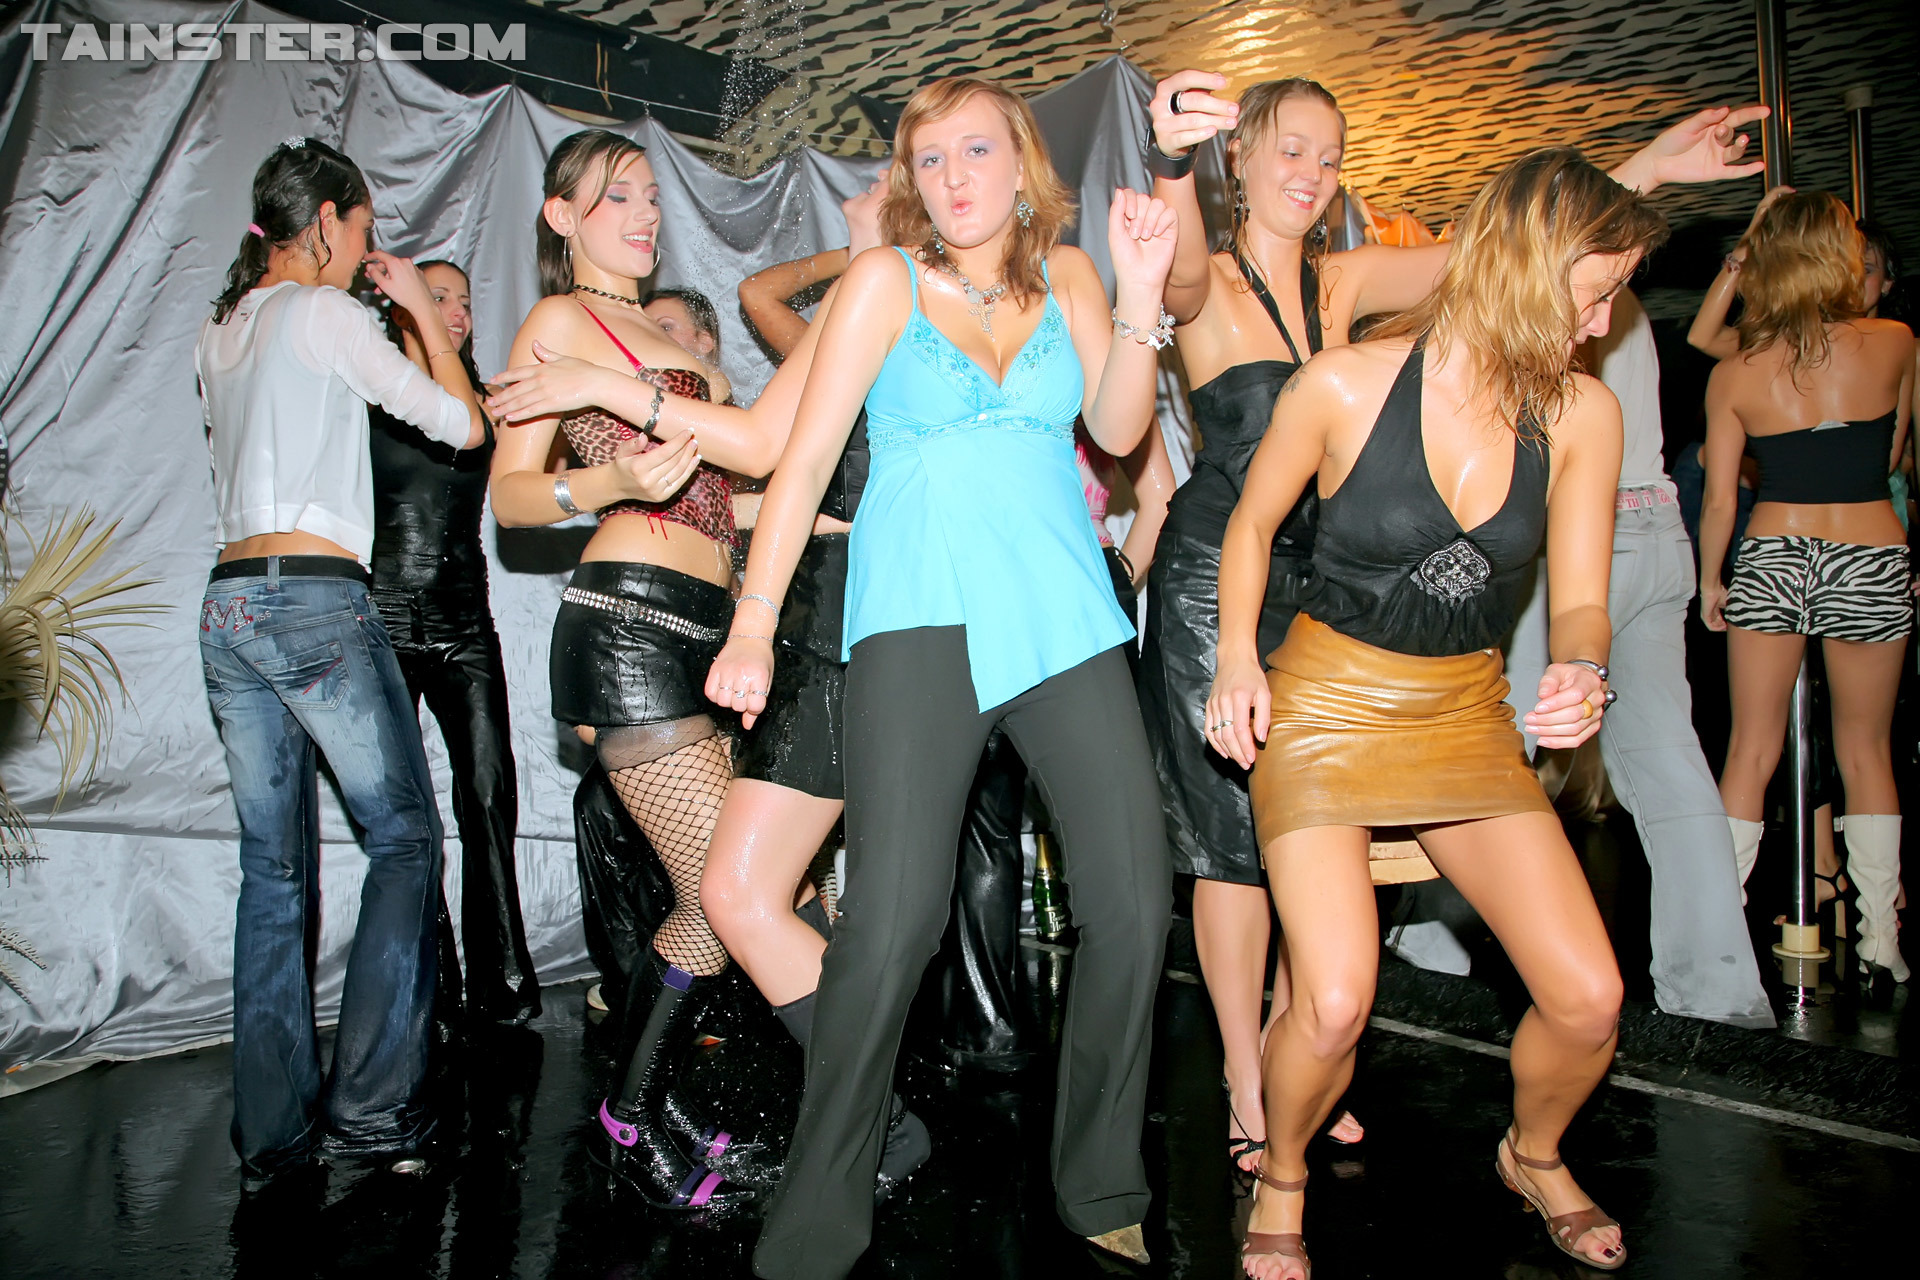 2Cam Porn lesbian monster fucking bash part 2 – cam 1 – x private club